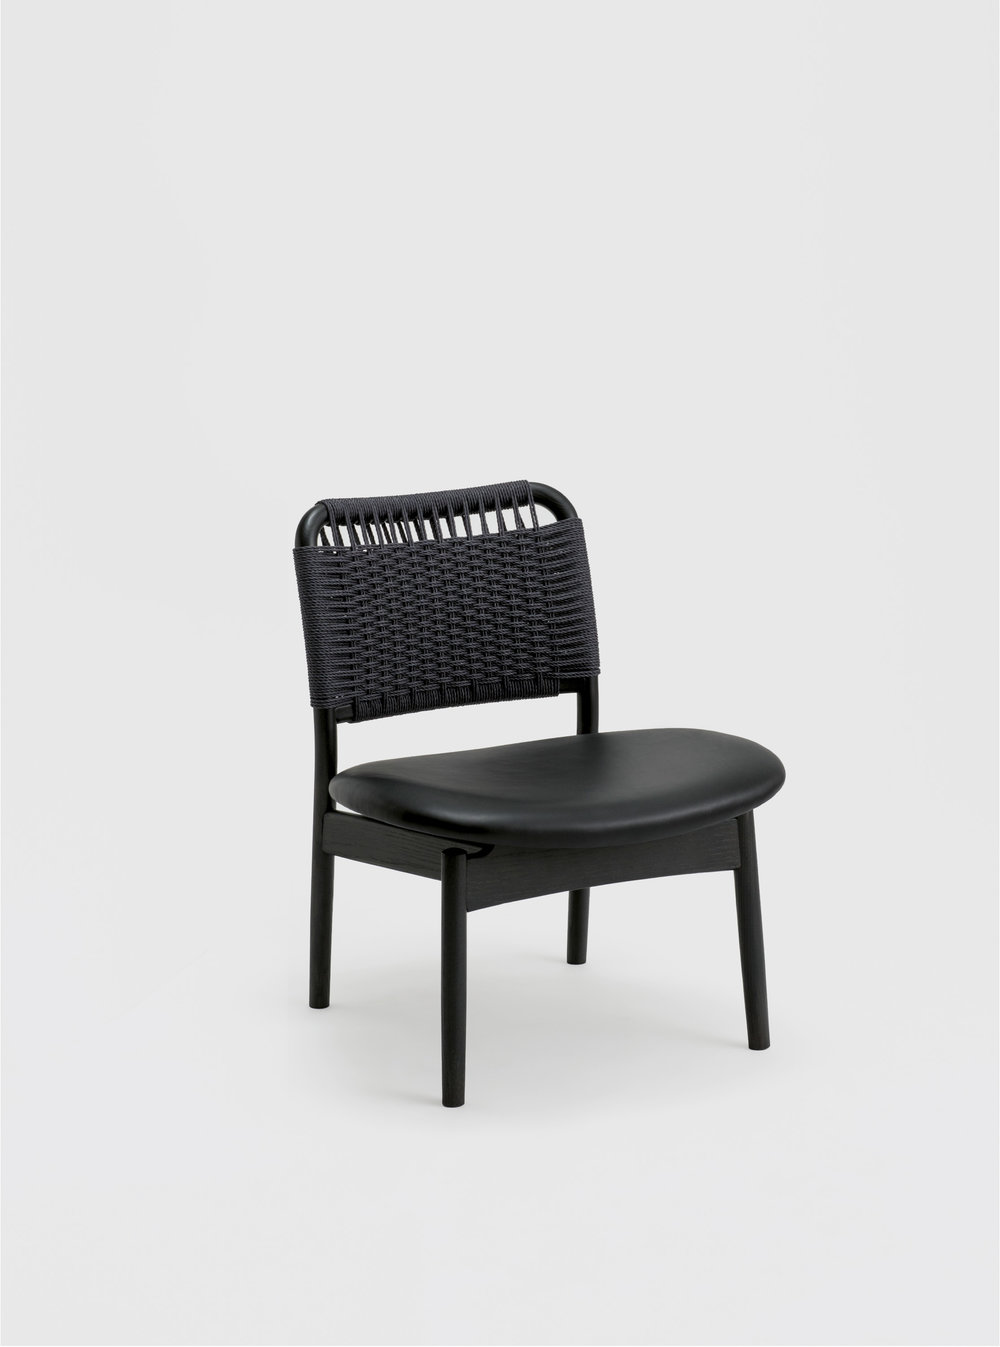 Ariake Saga Low Chair - Sumi Ash/Leather Seat